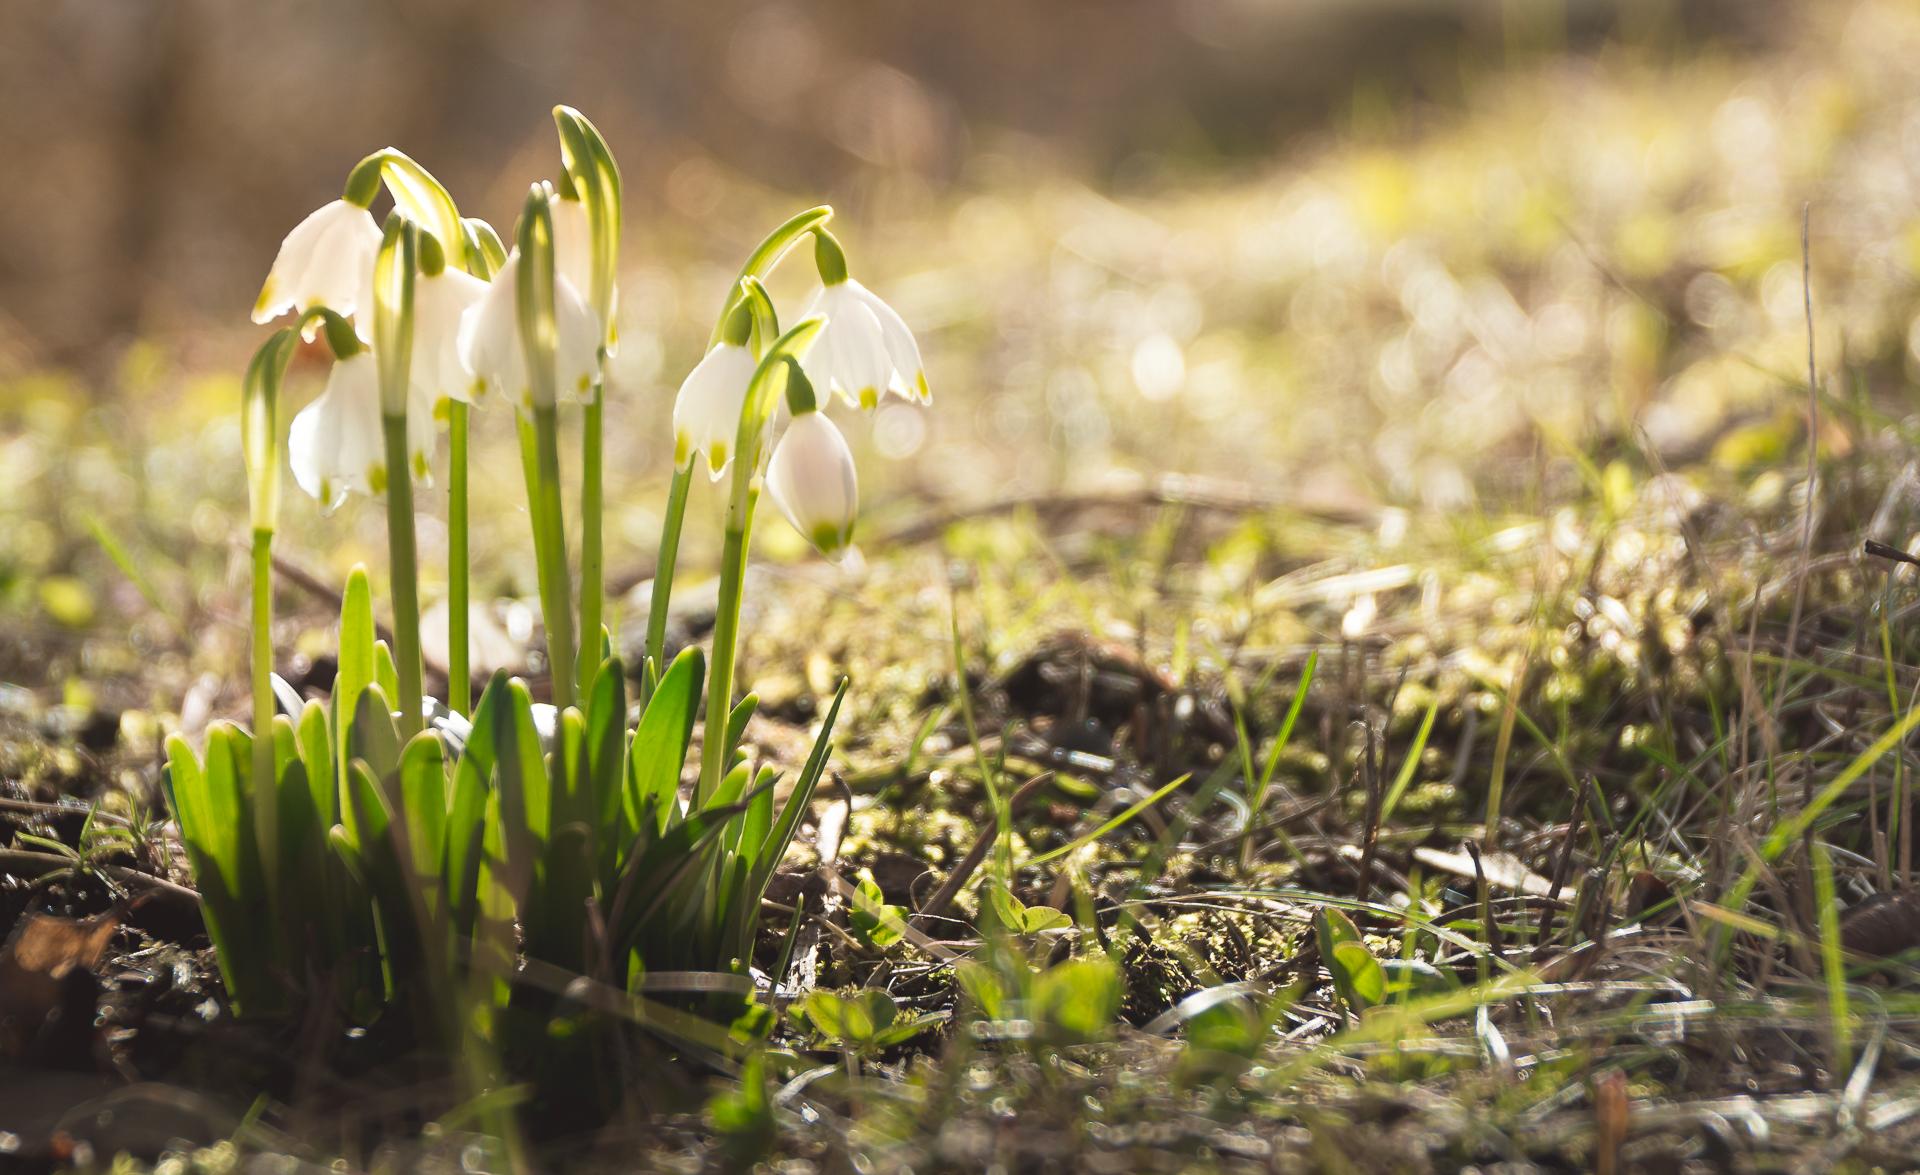 Wallpaper Flower Blume Spring Fruhling Nature Natur Nikon